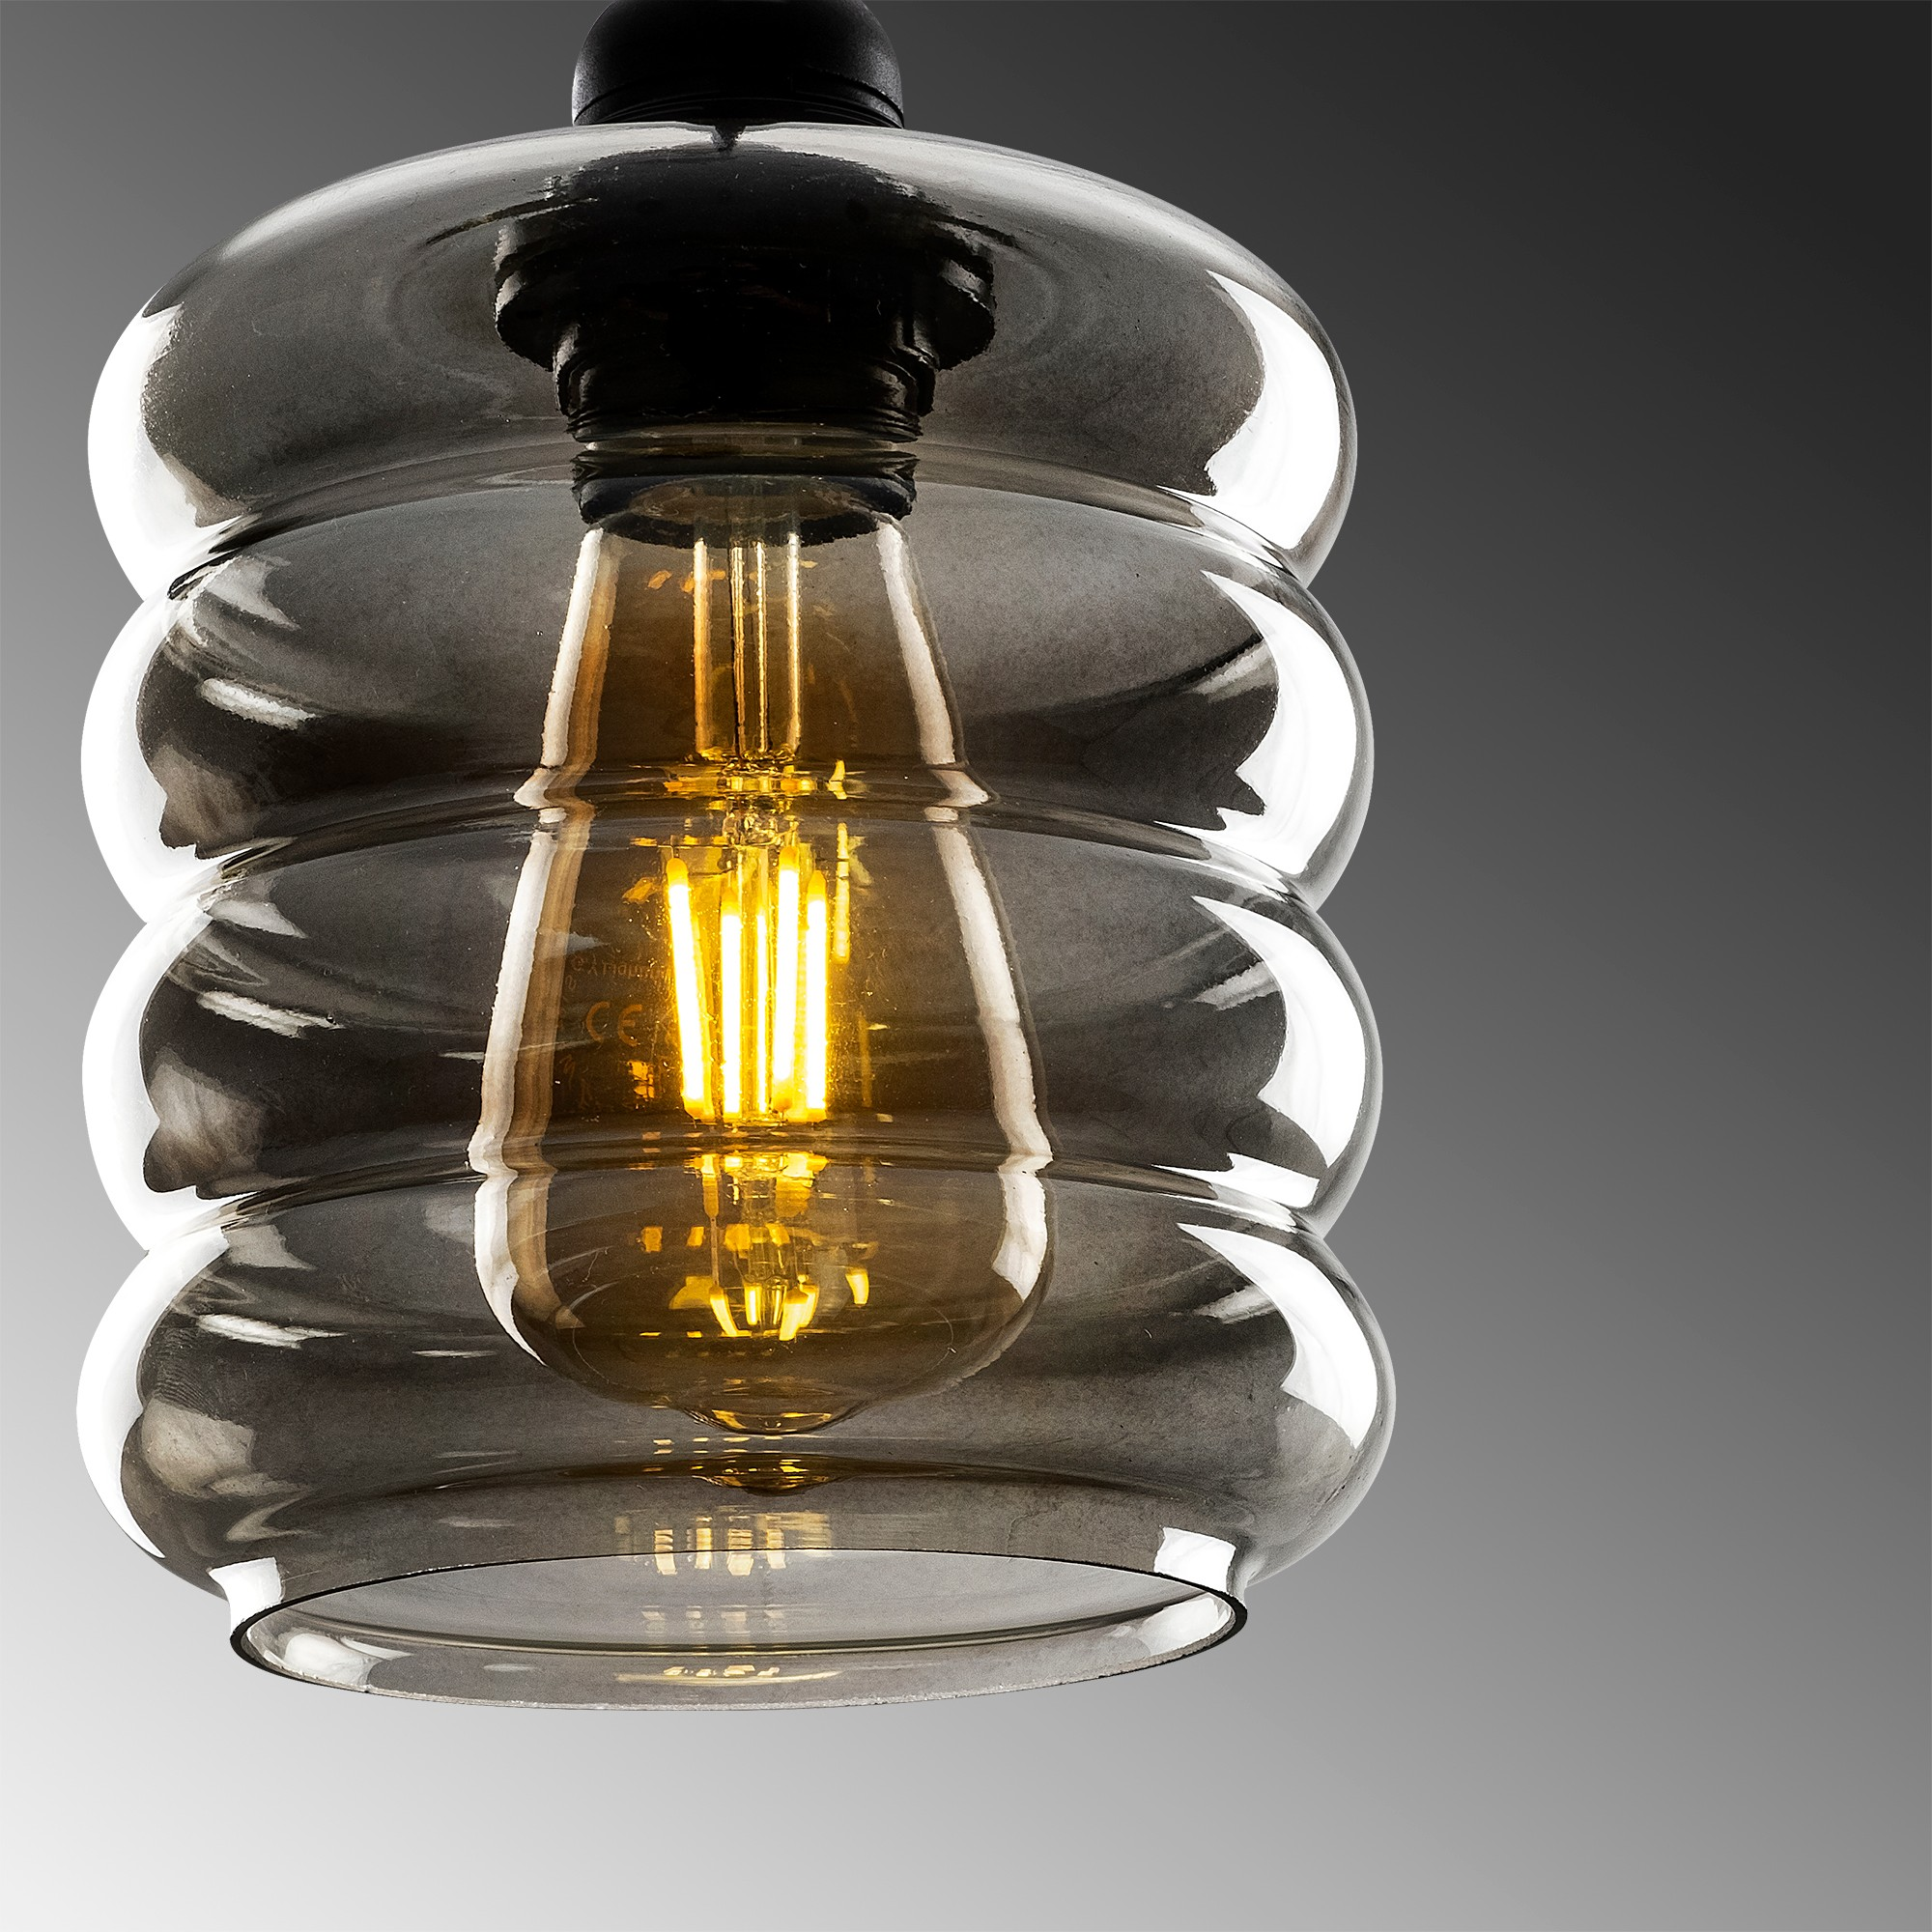 Led hanglamp met golven 1 x E27 fitting - closeup